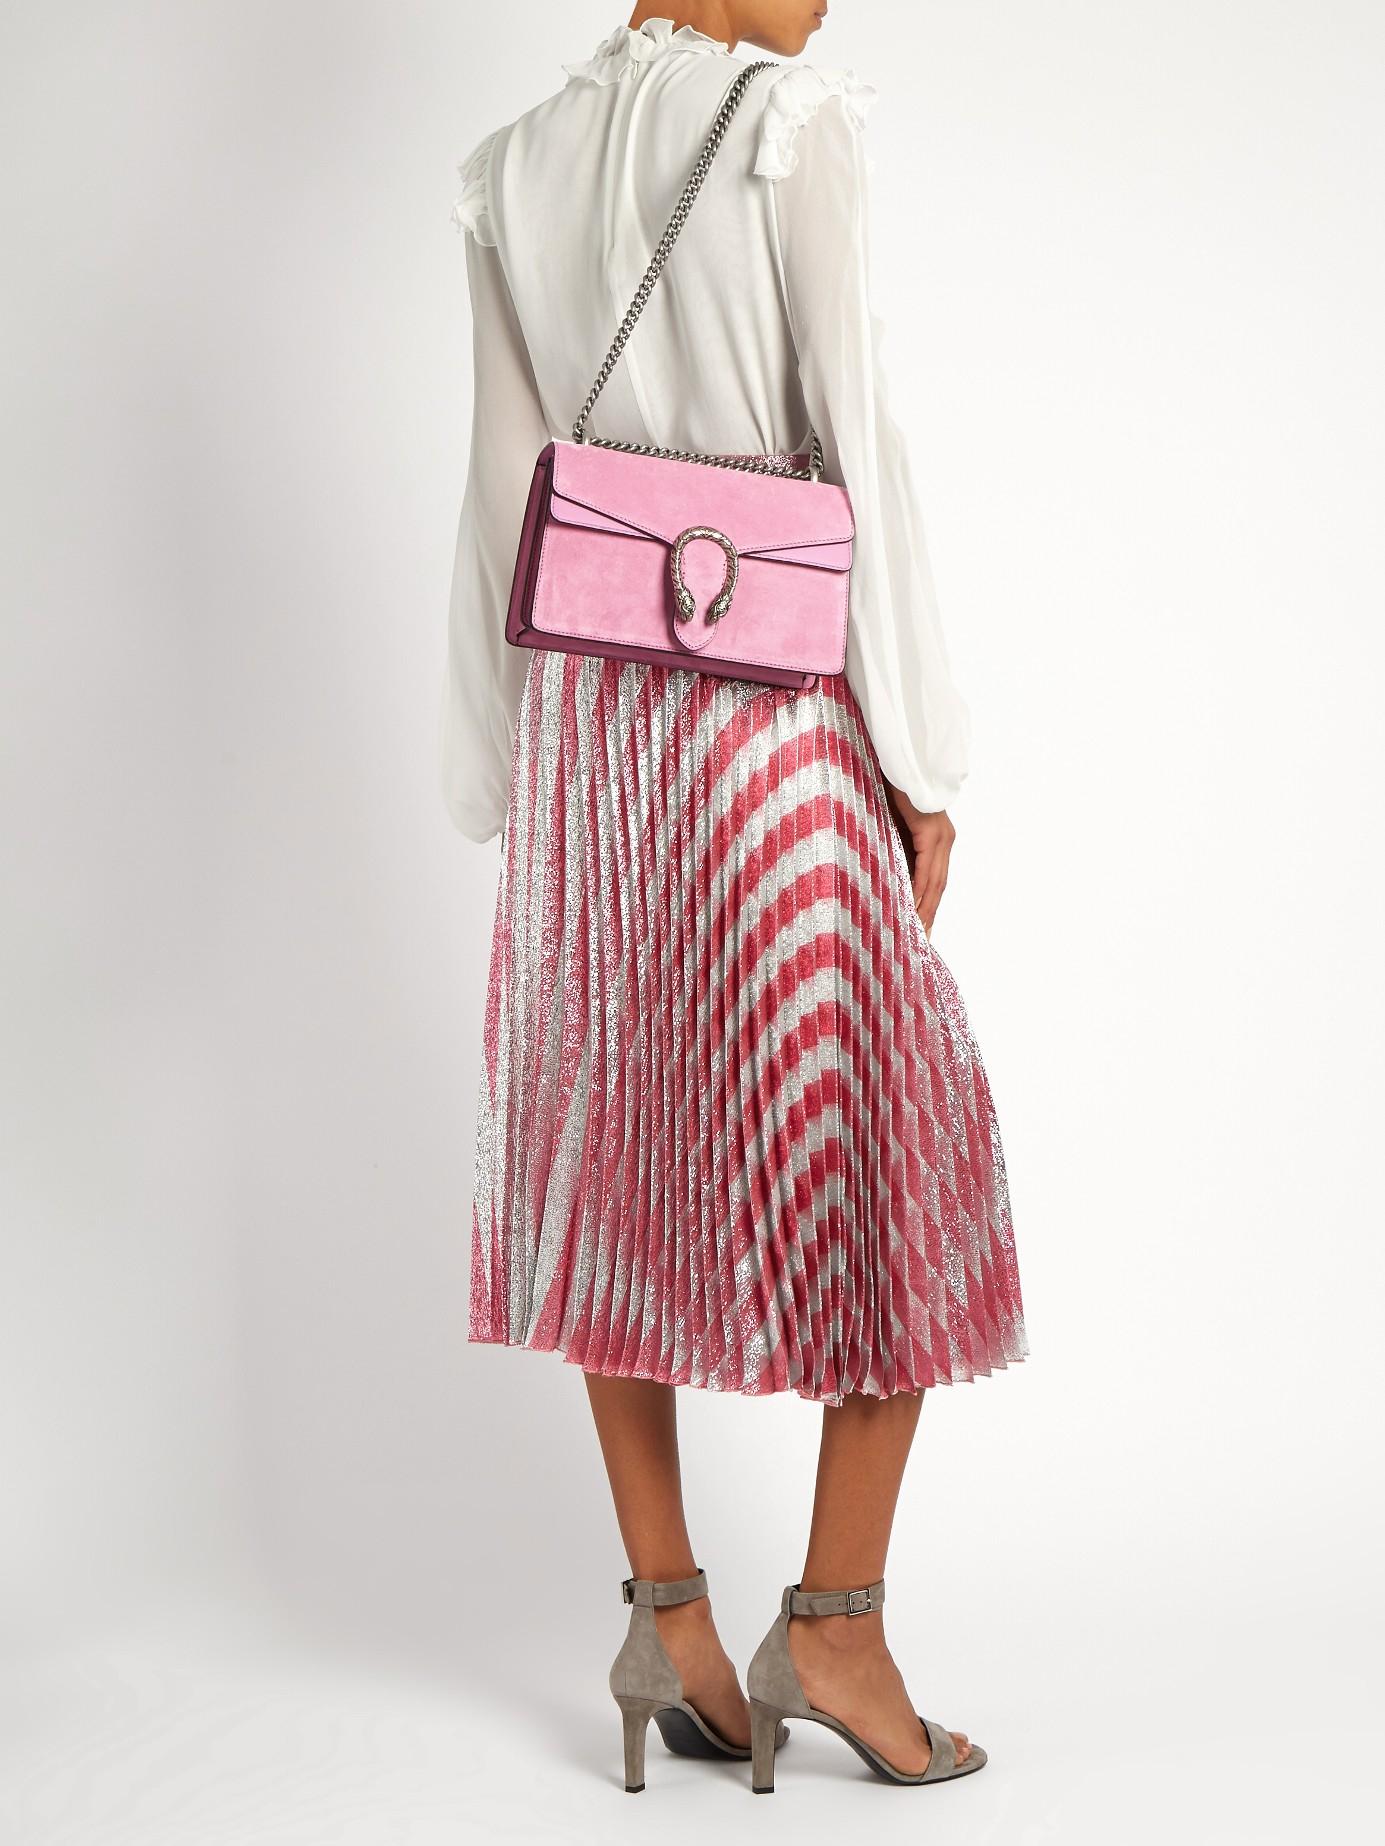 9d140659ceb3 Gucci Dionysus Suede Shoulder Bag in Pink - Lyst